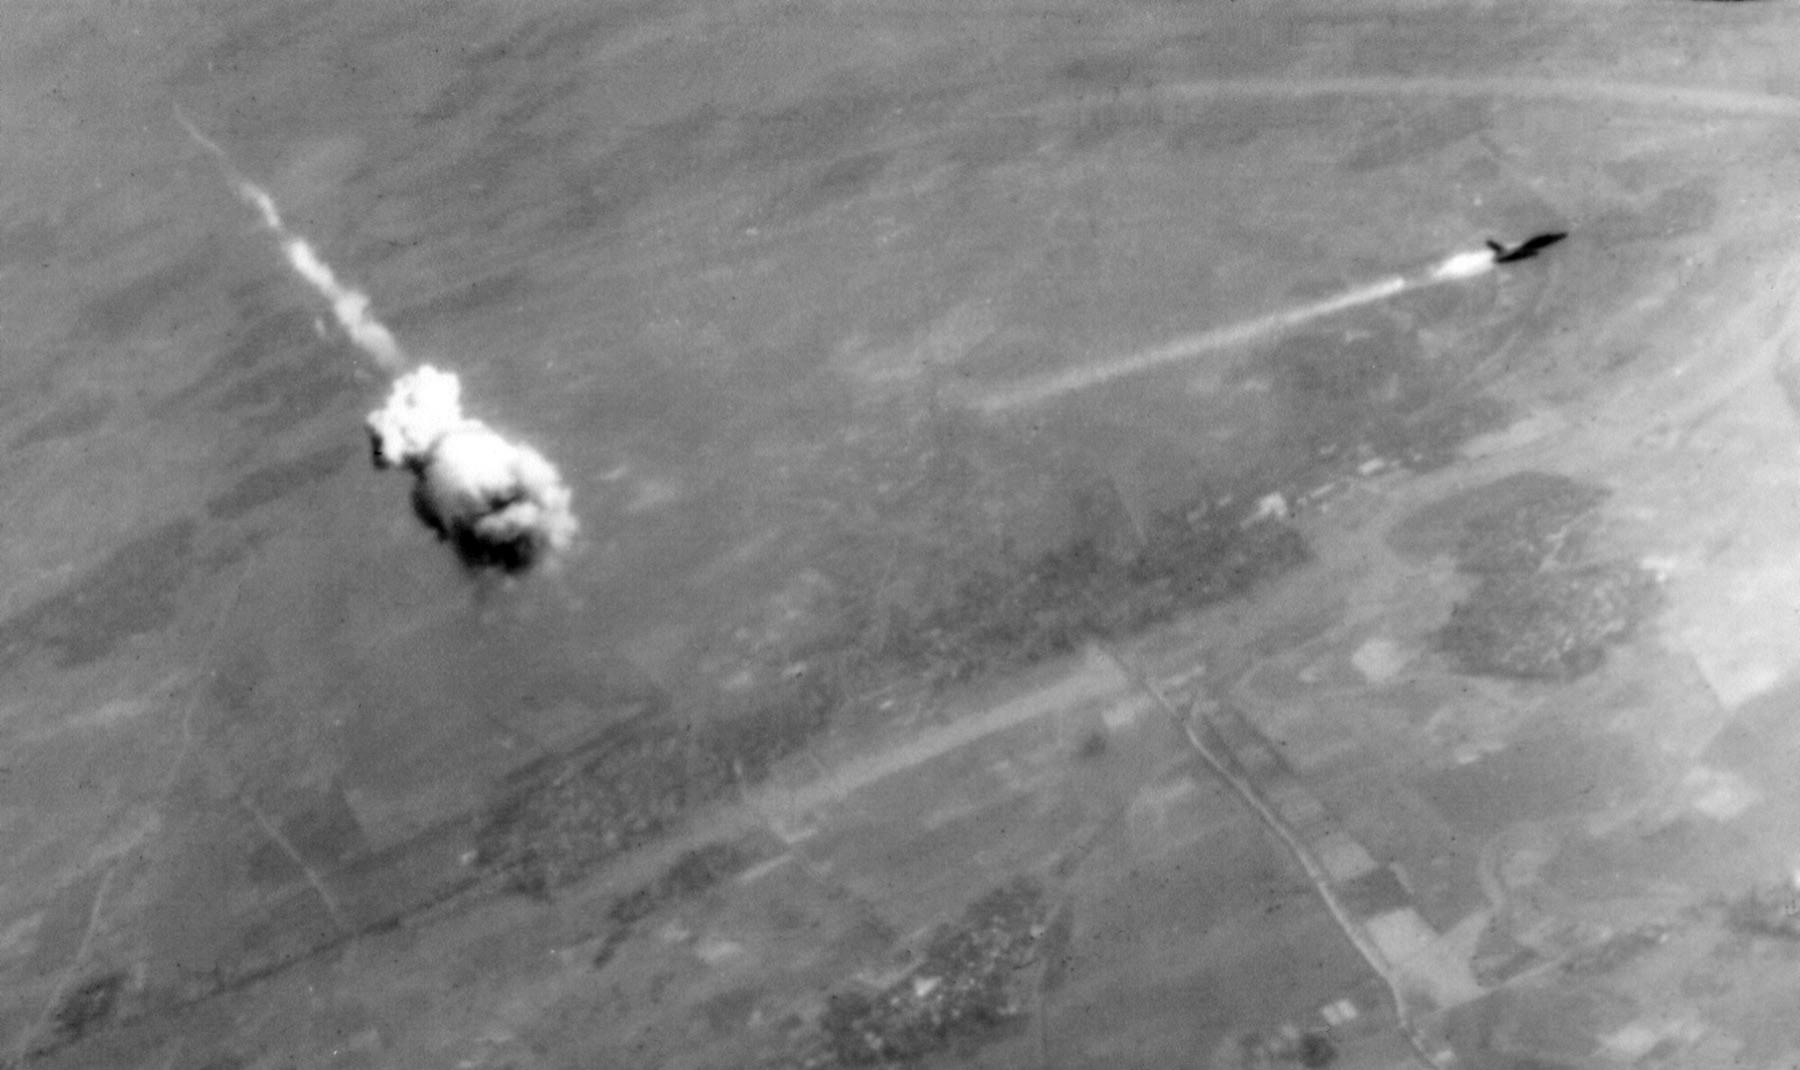 F-105_hit_by_SA-2_over_Vietnam.jpg